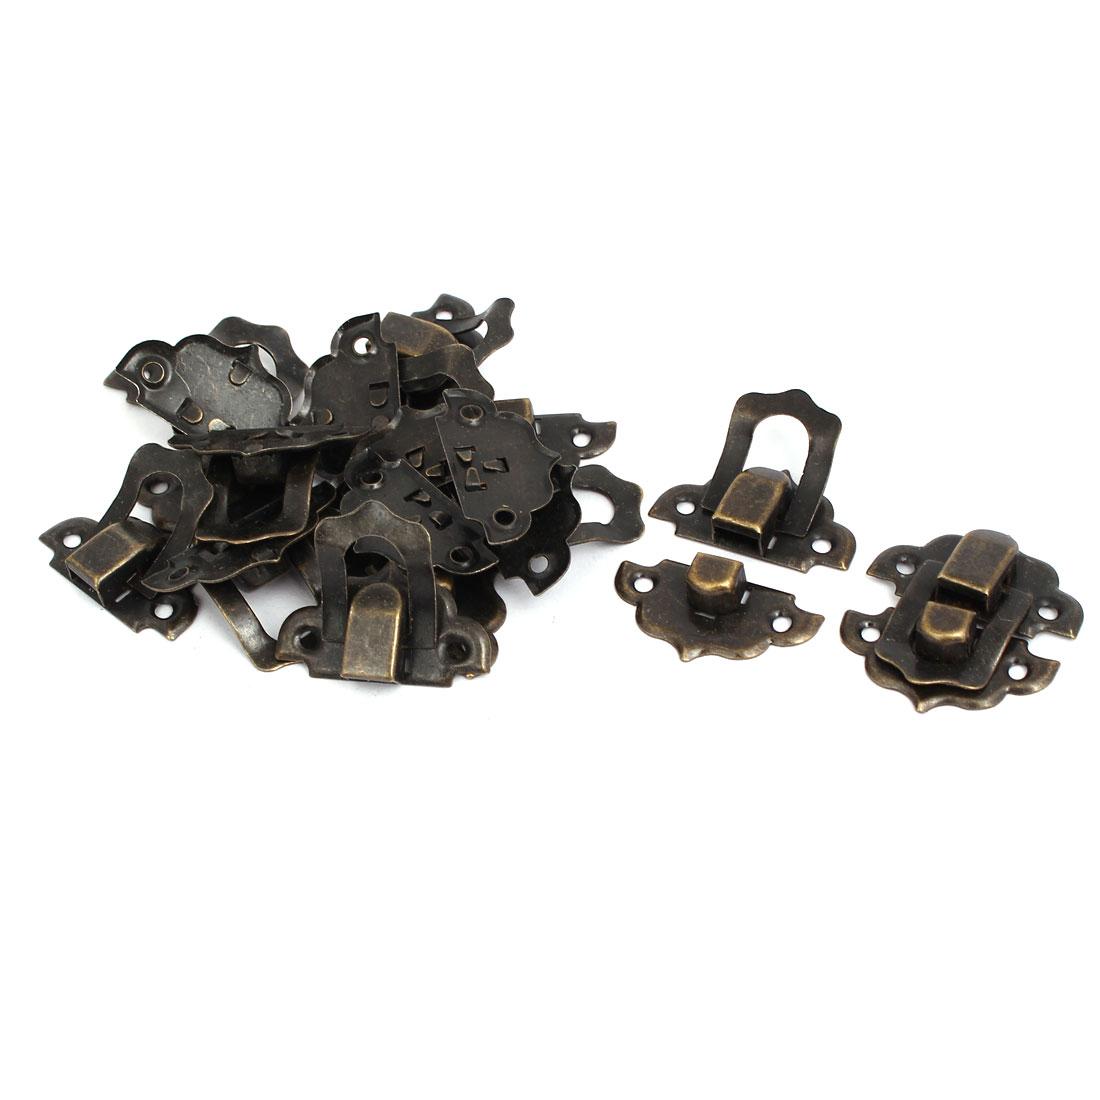 32mmx29mmx8mm Screw Fixed Catches Latches Locks Bronze Tone 10pcs for Box Case